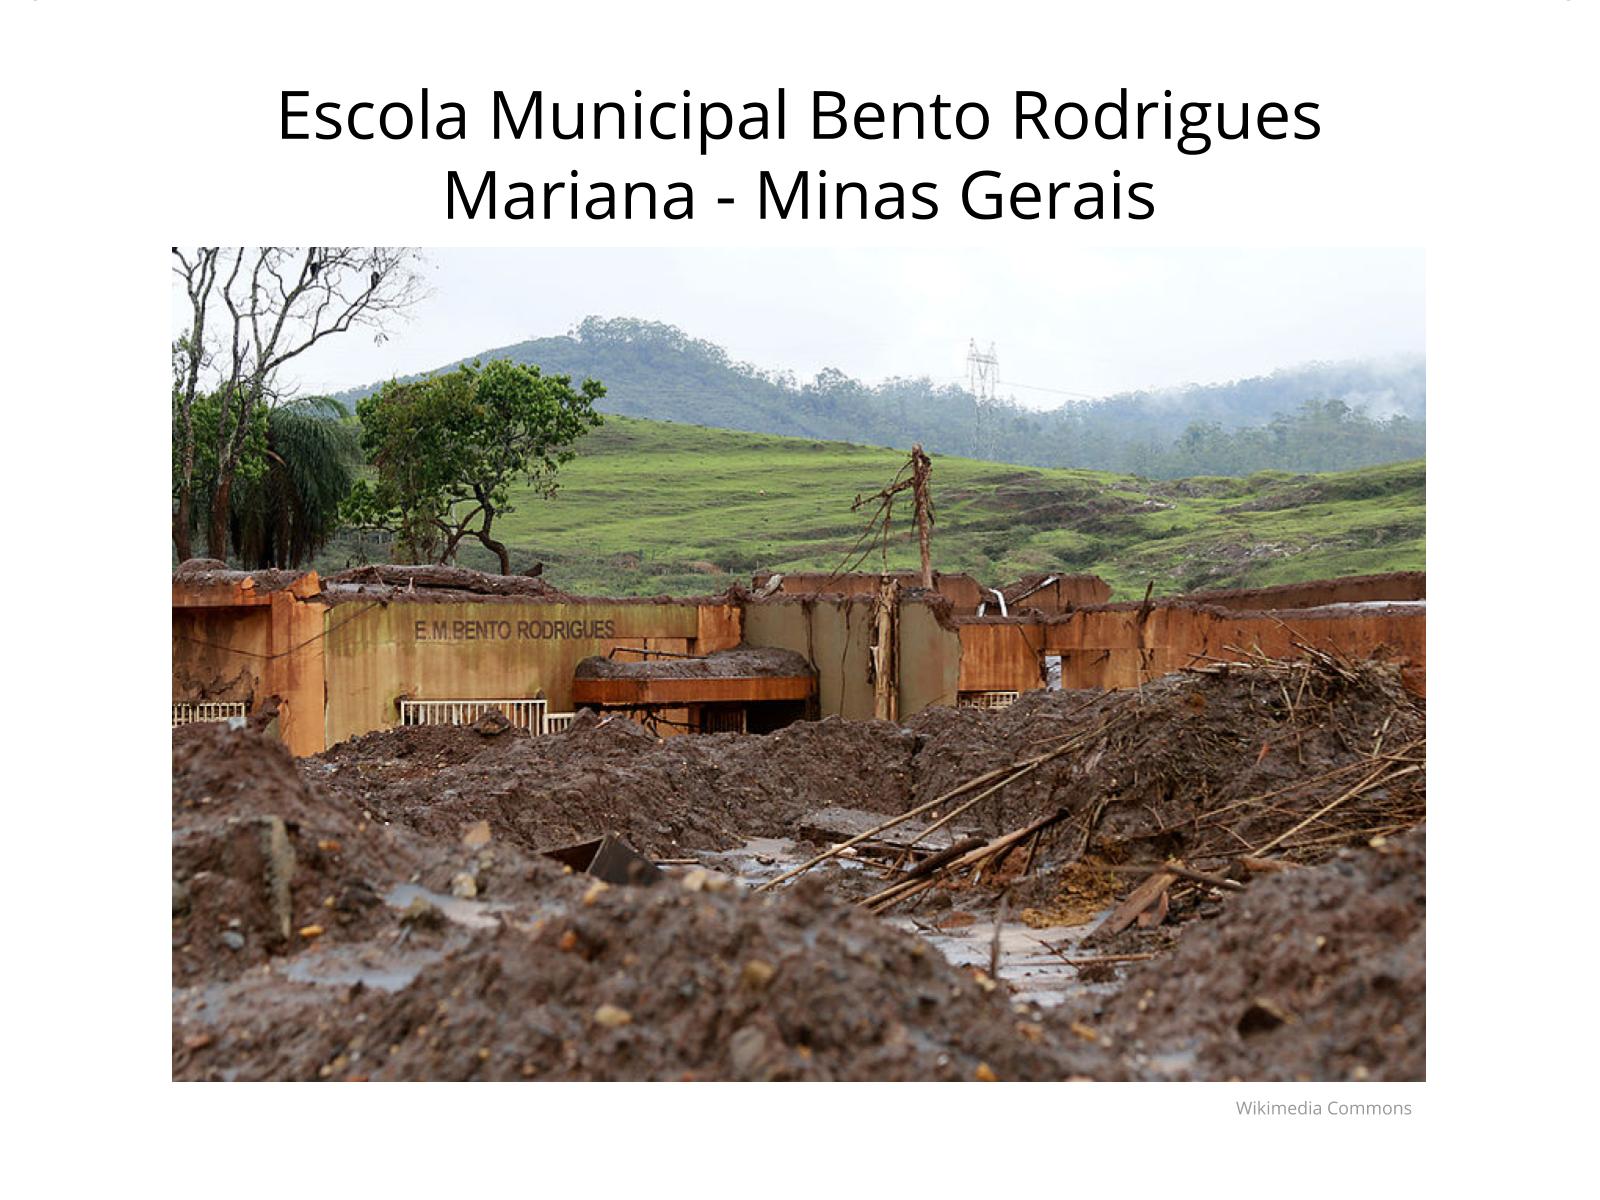 Mariana: Os males do desenvolvimento